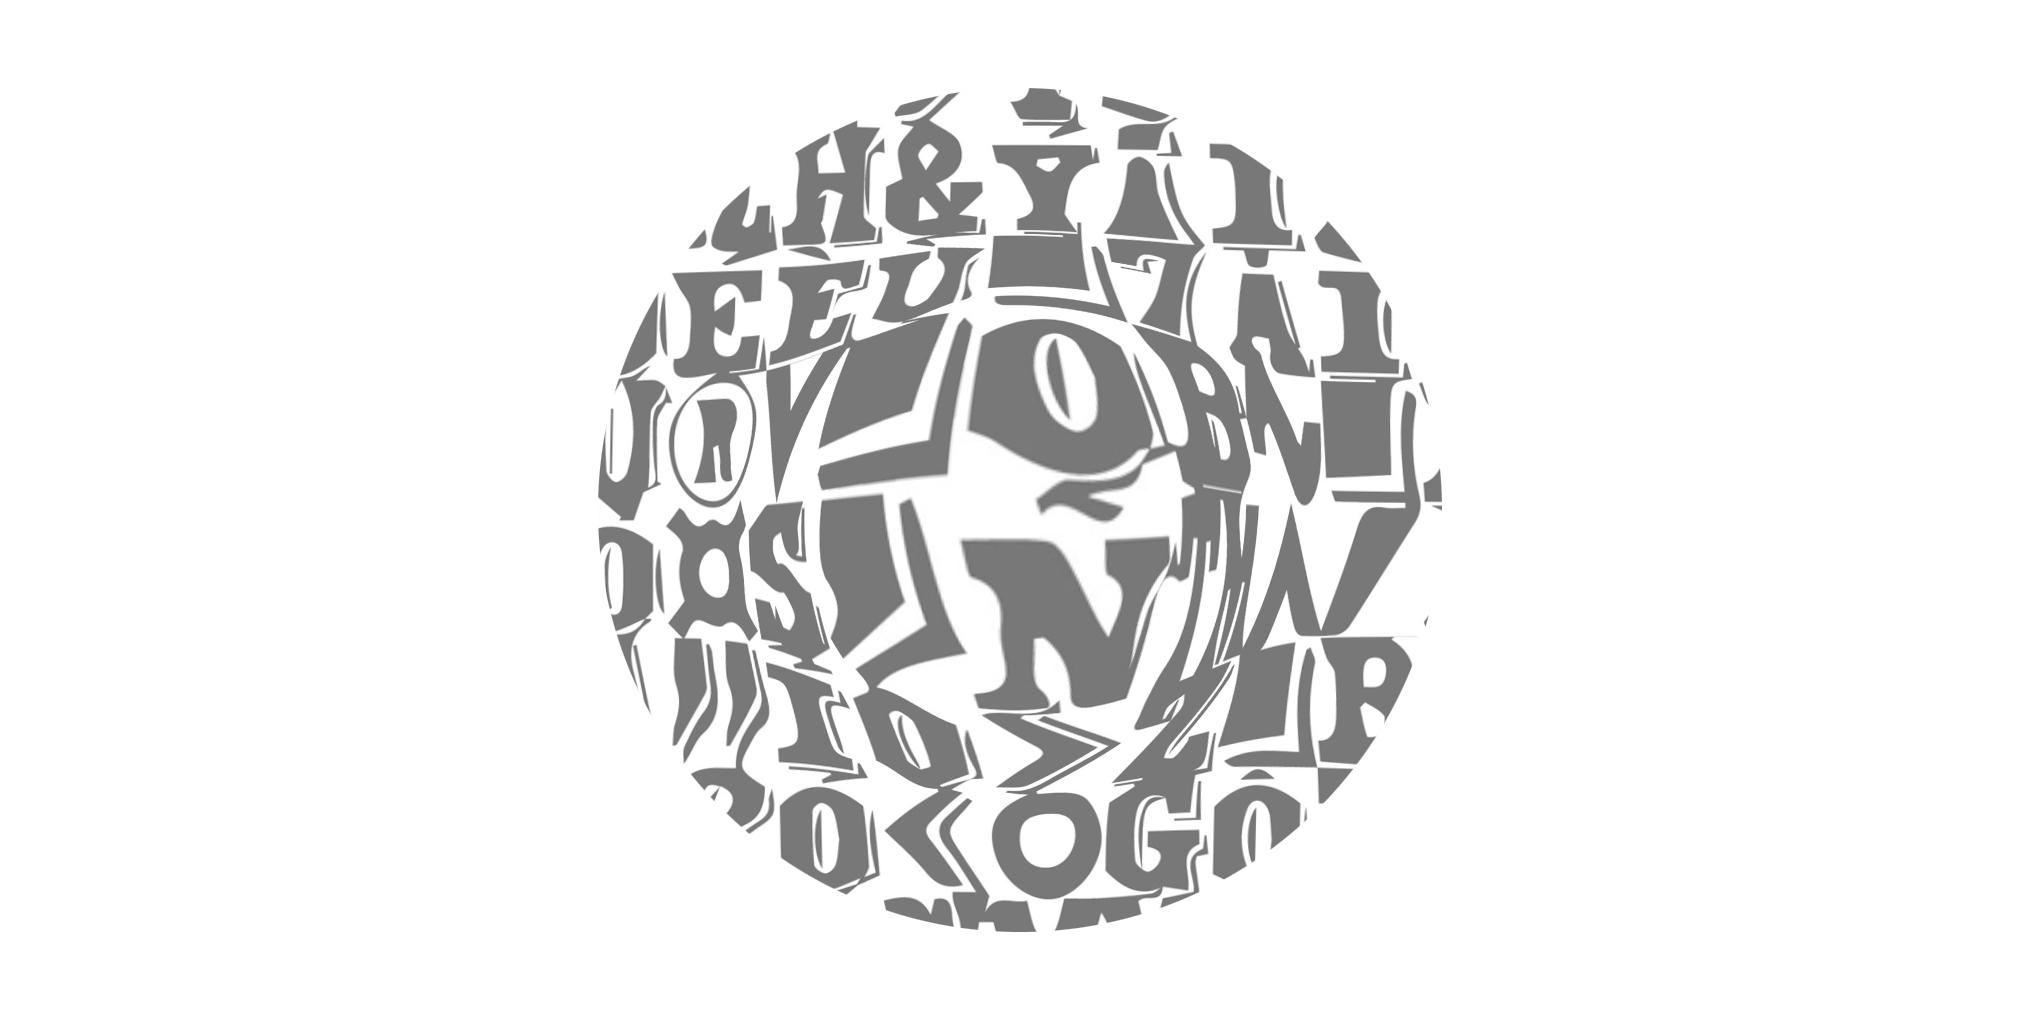 font-no-bx-file-in-fonts